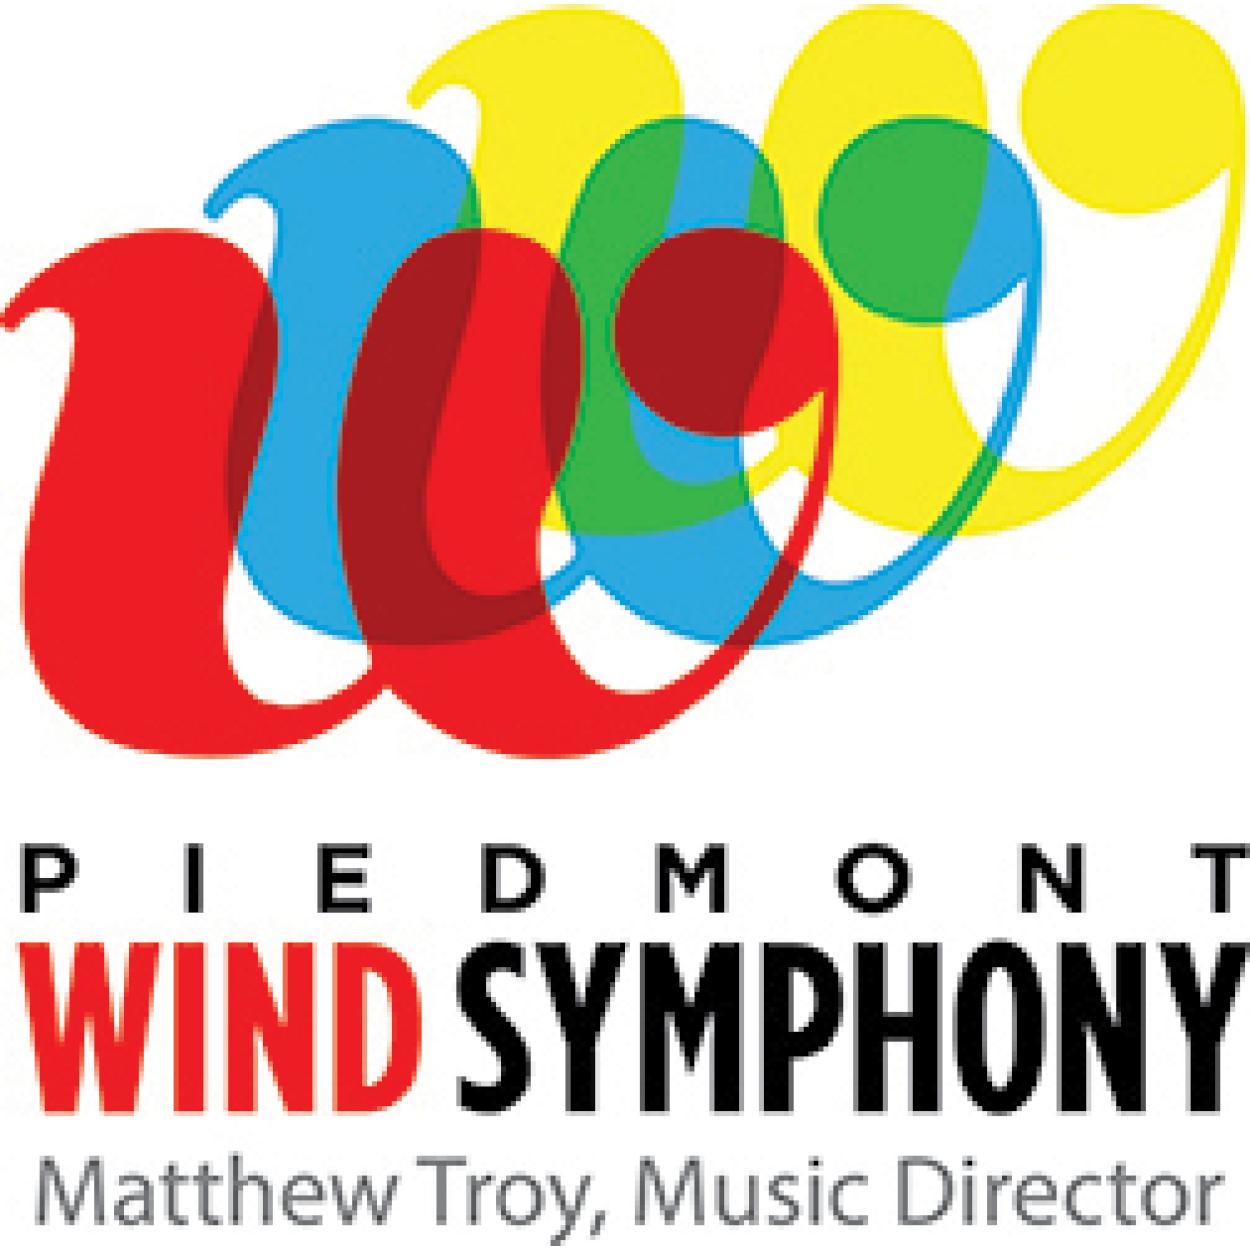 Piedmont Wind Symphony